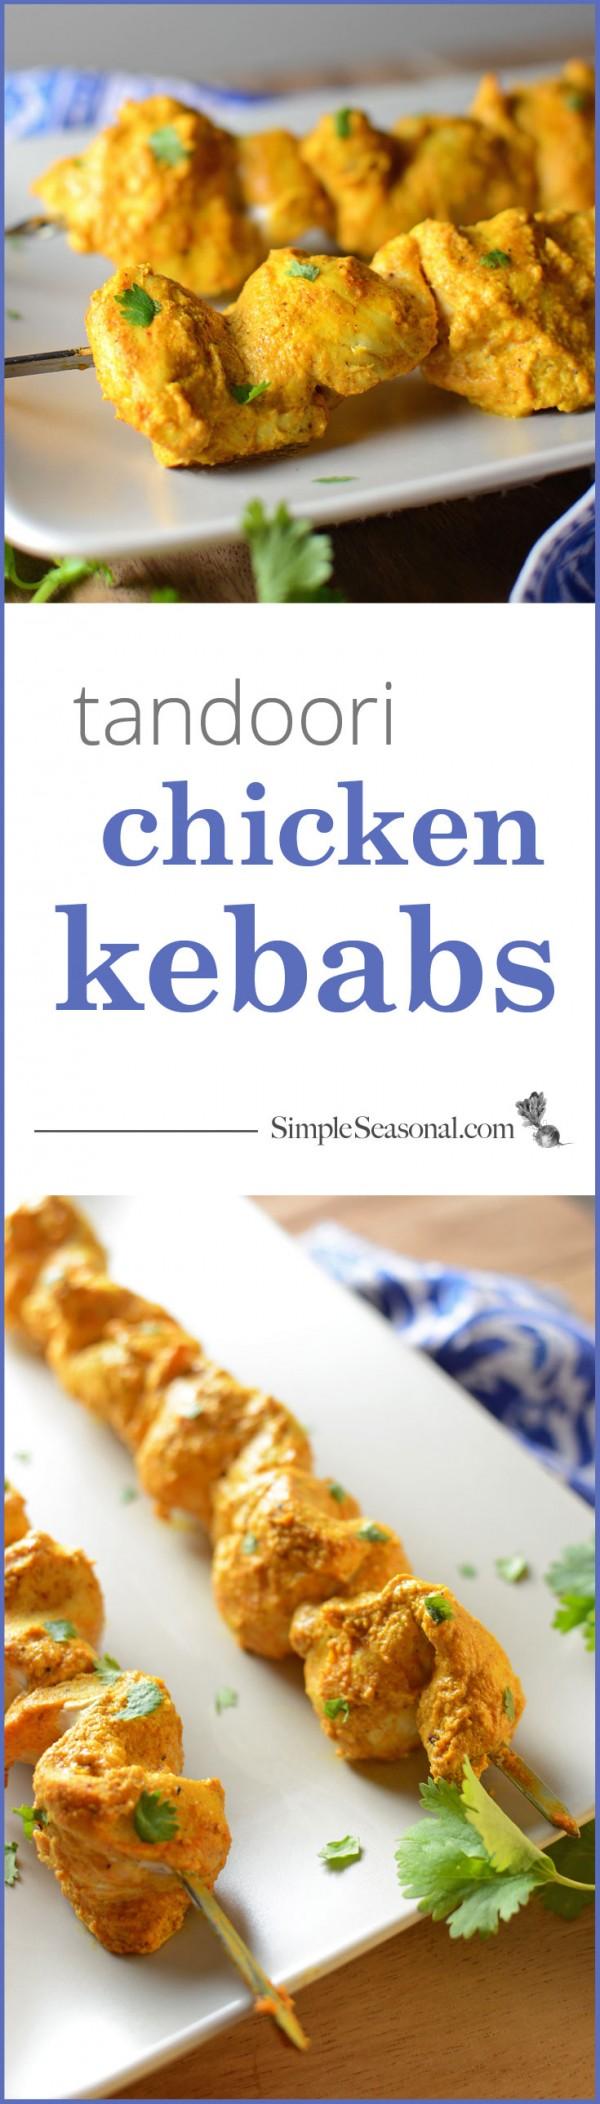 tandoori chicken kebabs for pinterest